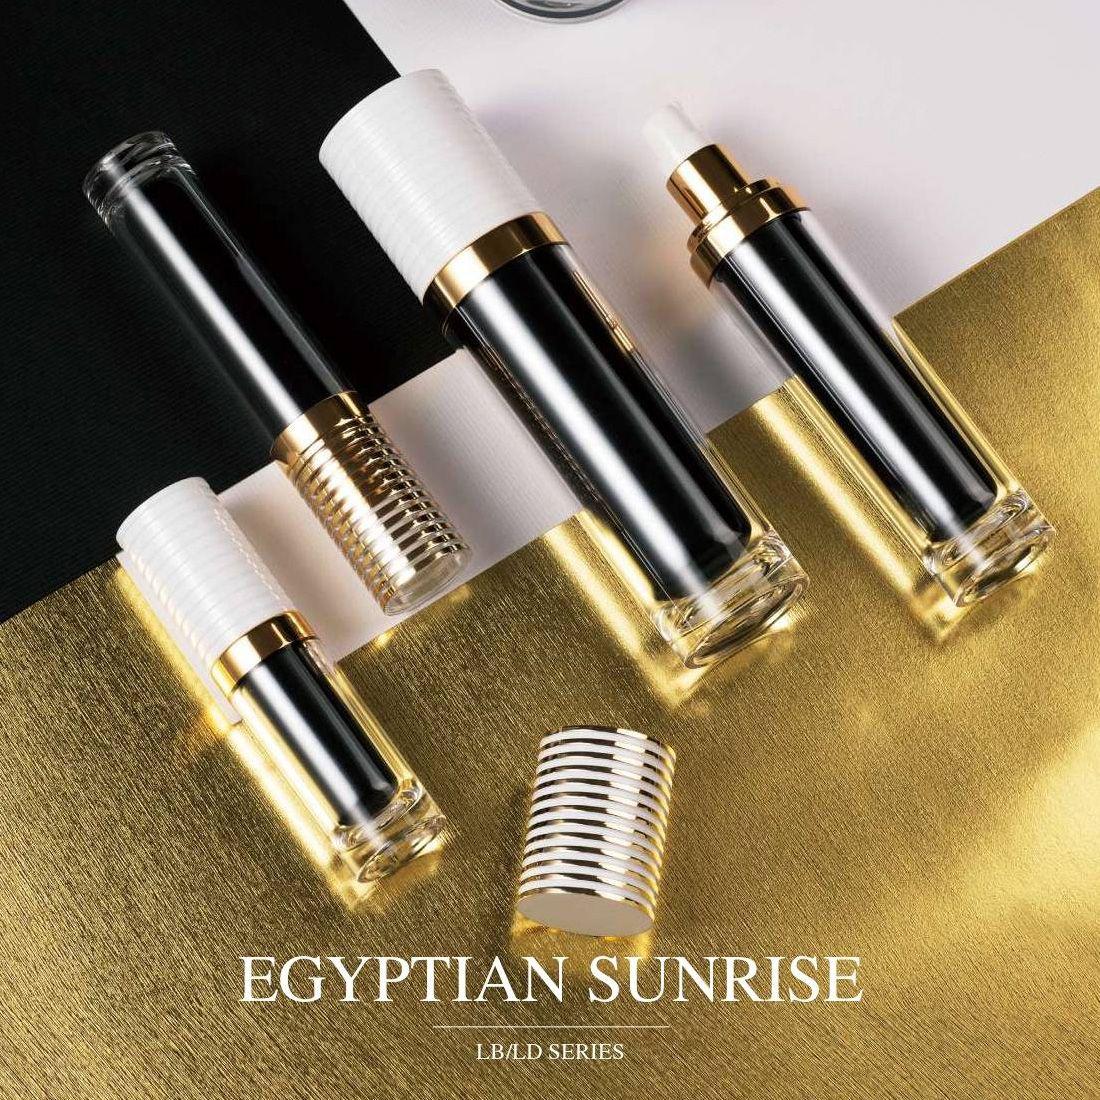 COSJAR design de containere comode - Seria de rasarit egiptean